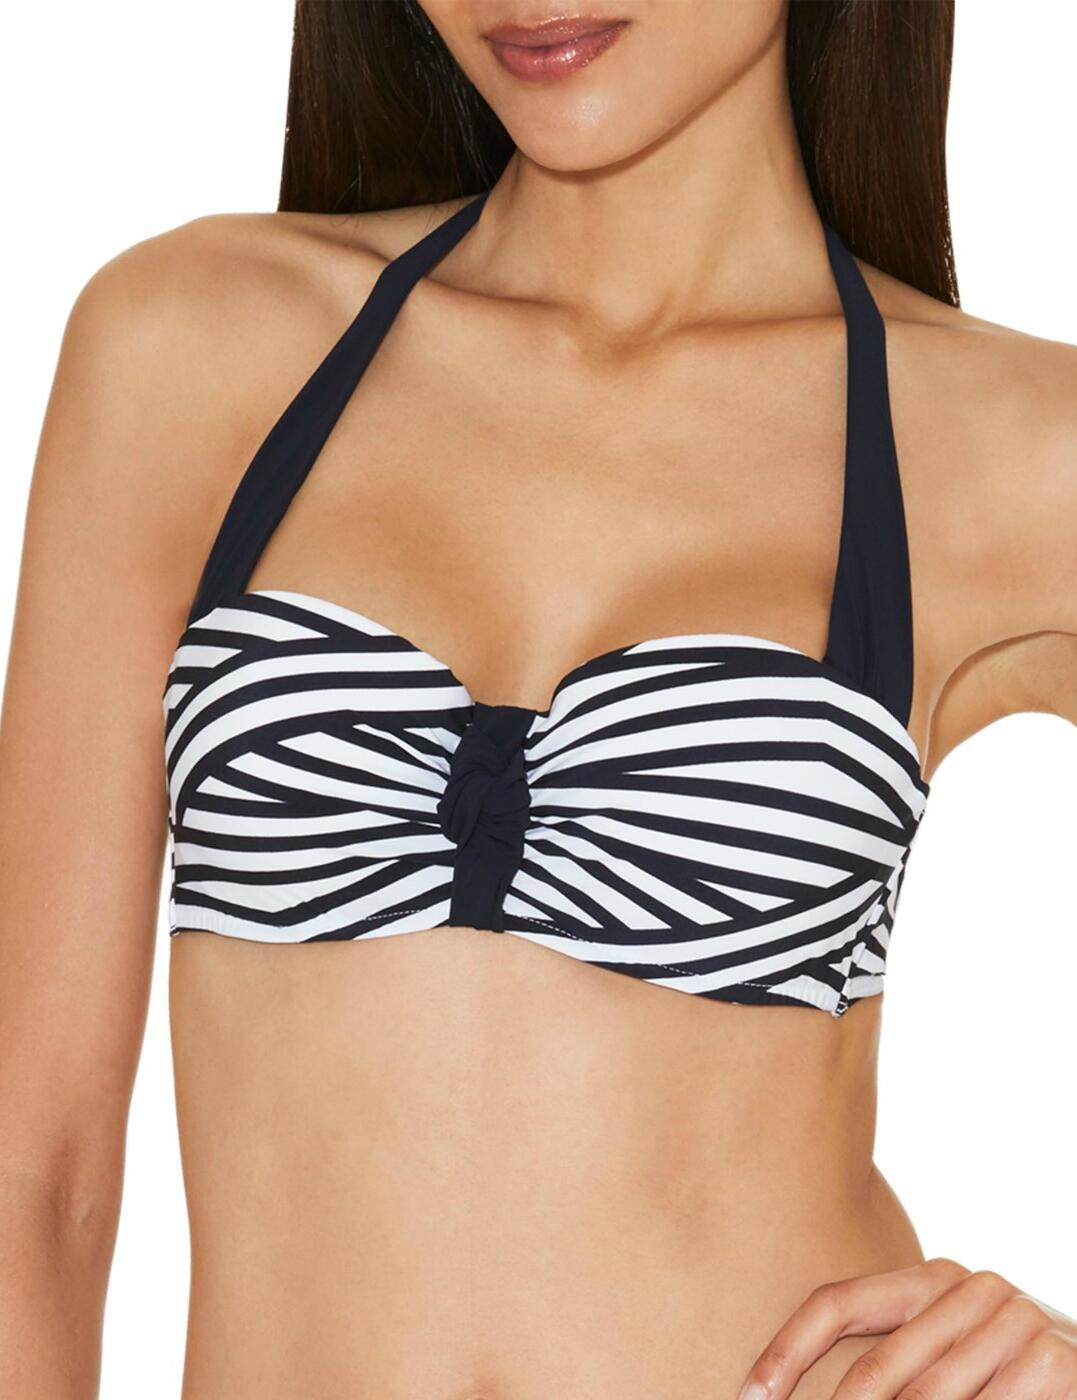 ER06 Aubade Ocean Bow Bandeau Bikini Top - ER06 Sailor